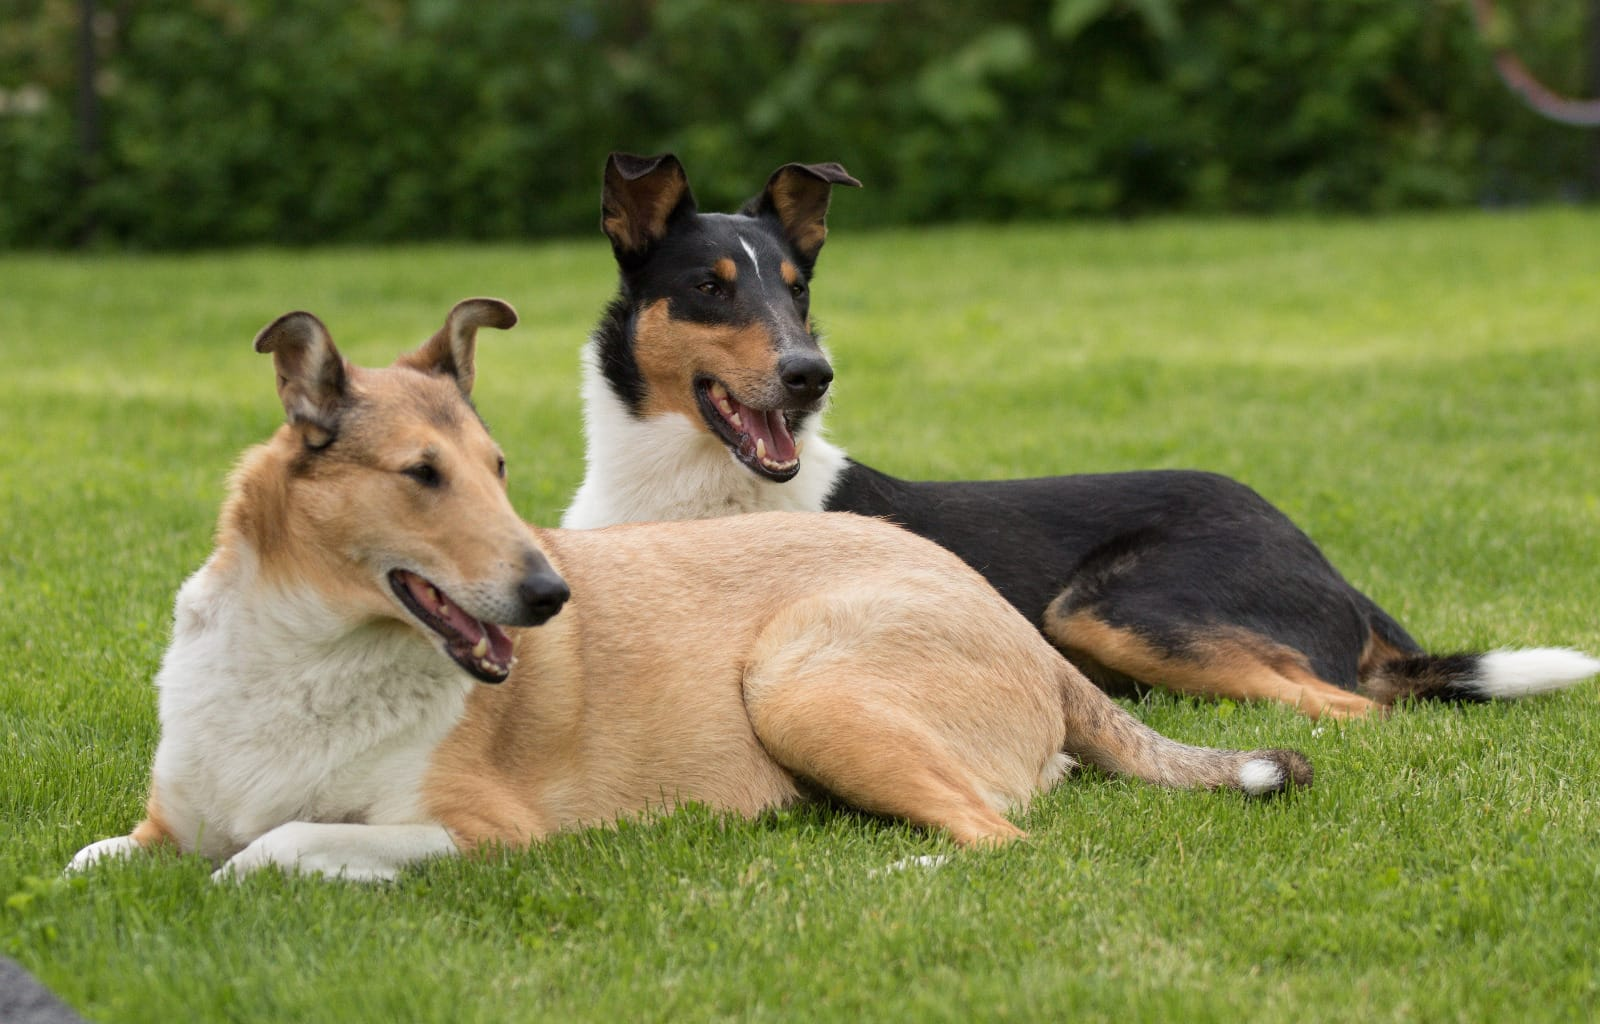 Collie Welpen Rassehunde Hunde Welpen Haustier Anzeiger